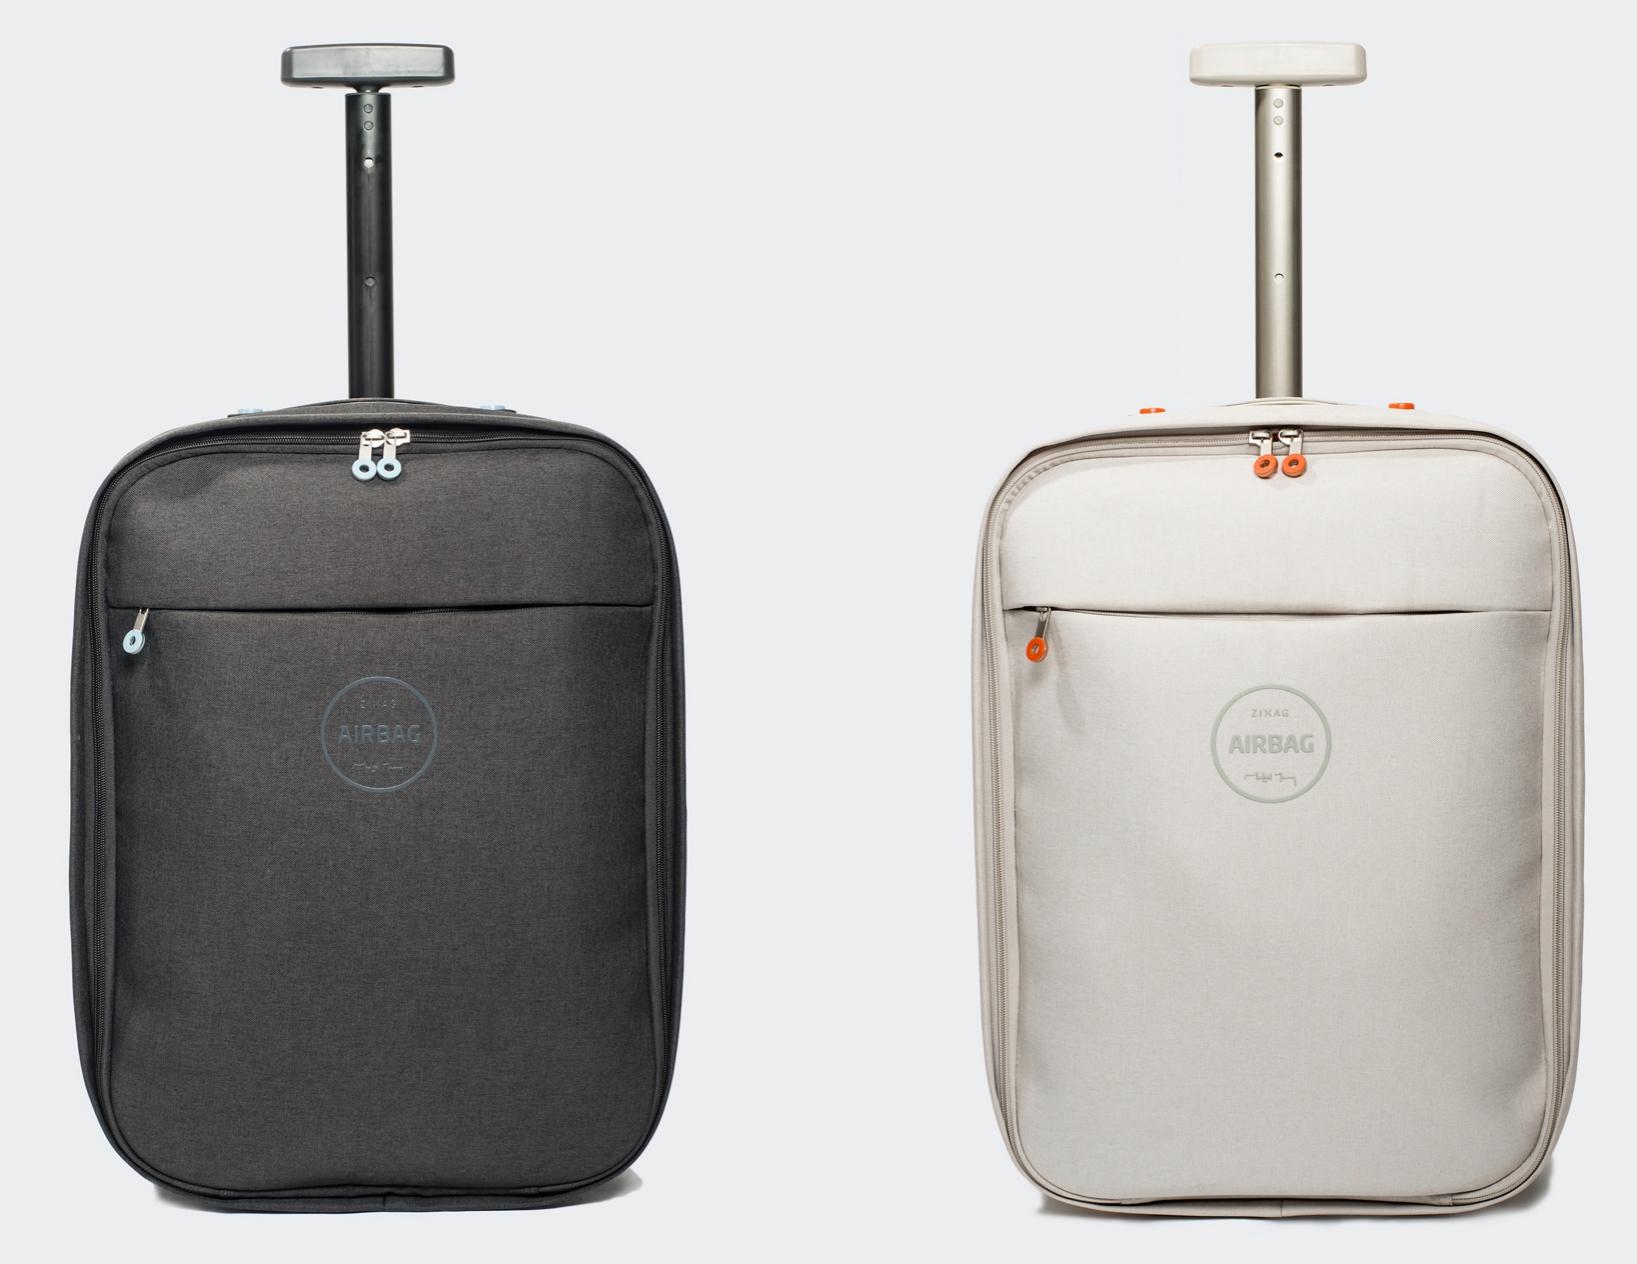 Zixag -AirBag Carryon Travel